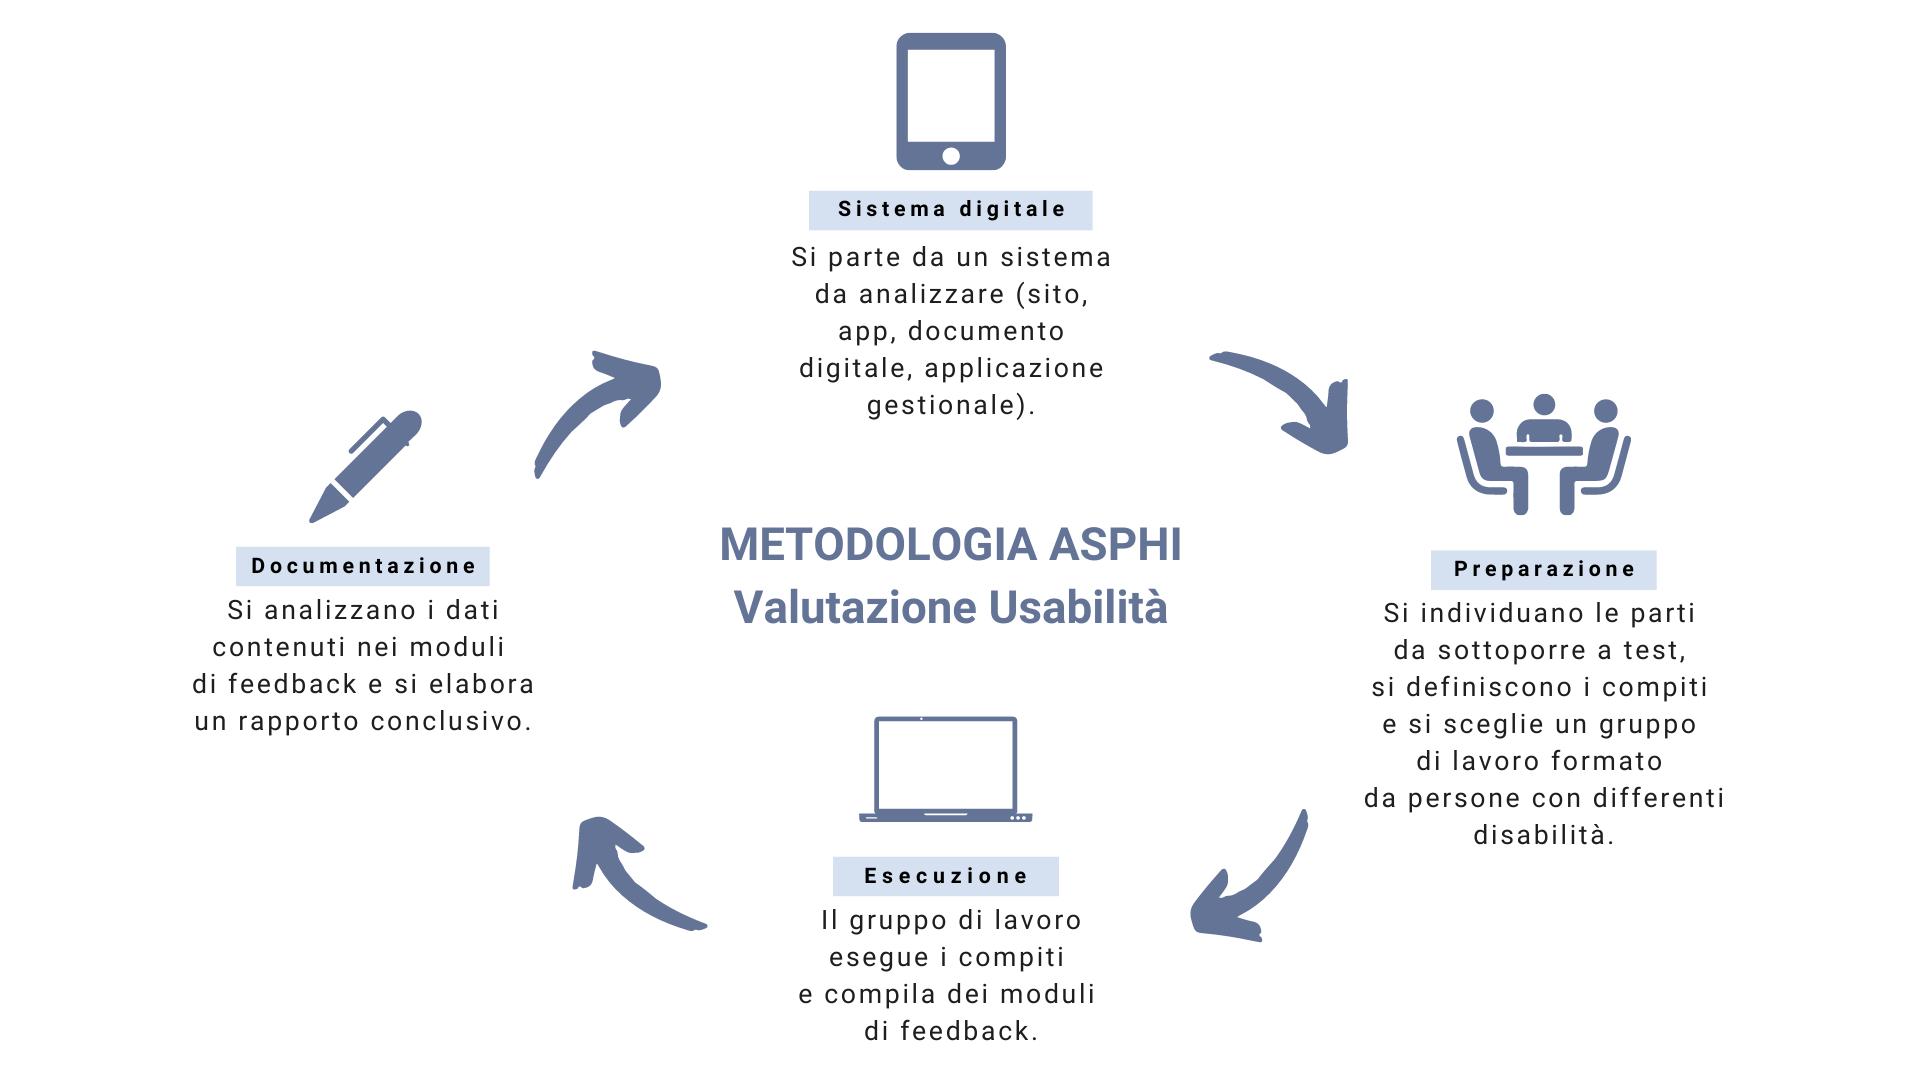 Metodologia ASPHI Valutazione Usabilità